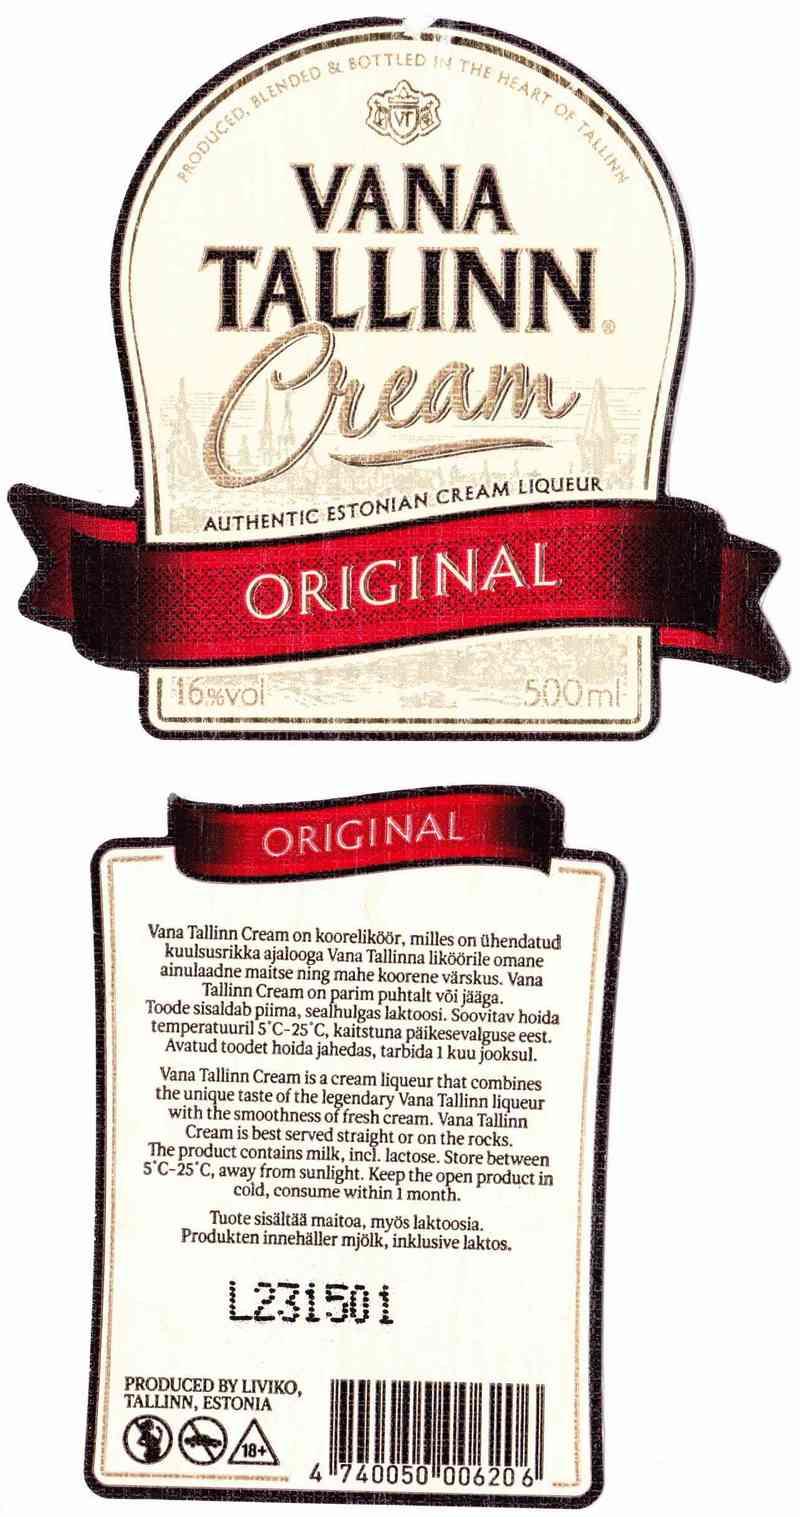 Ликер вана таллин (vana tallinn): состав, особенности вкуса, обзор линейки бренда